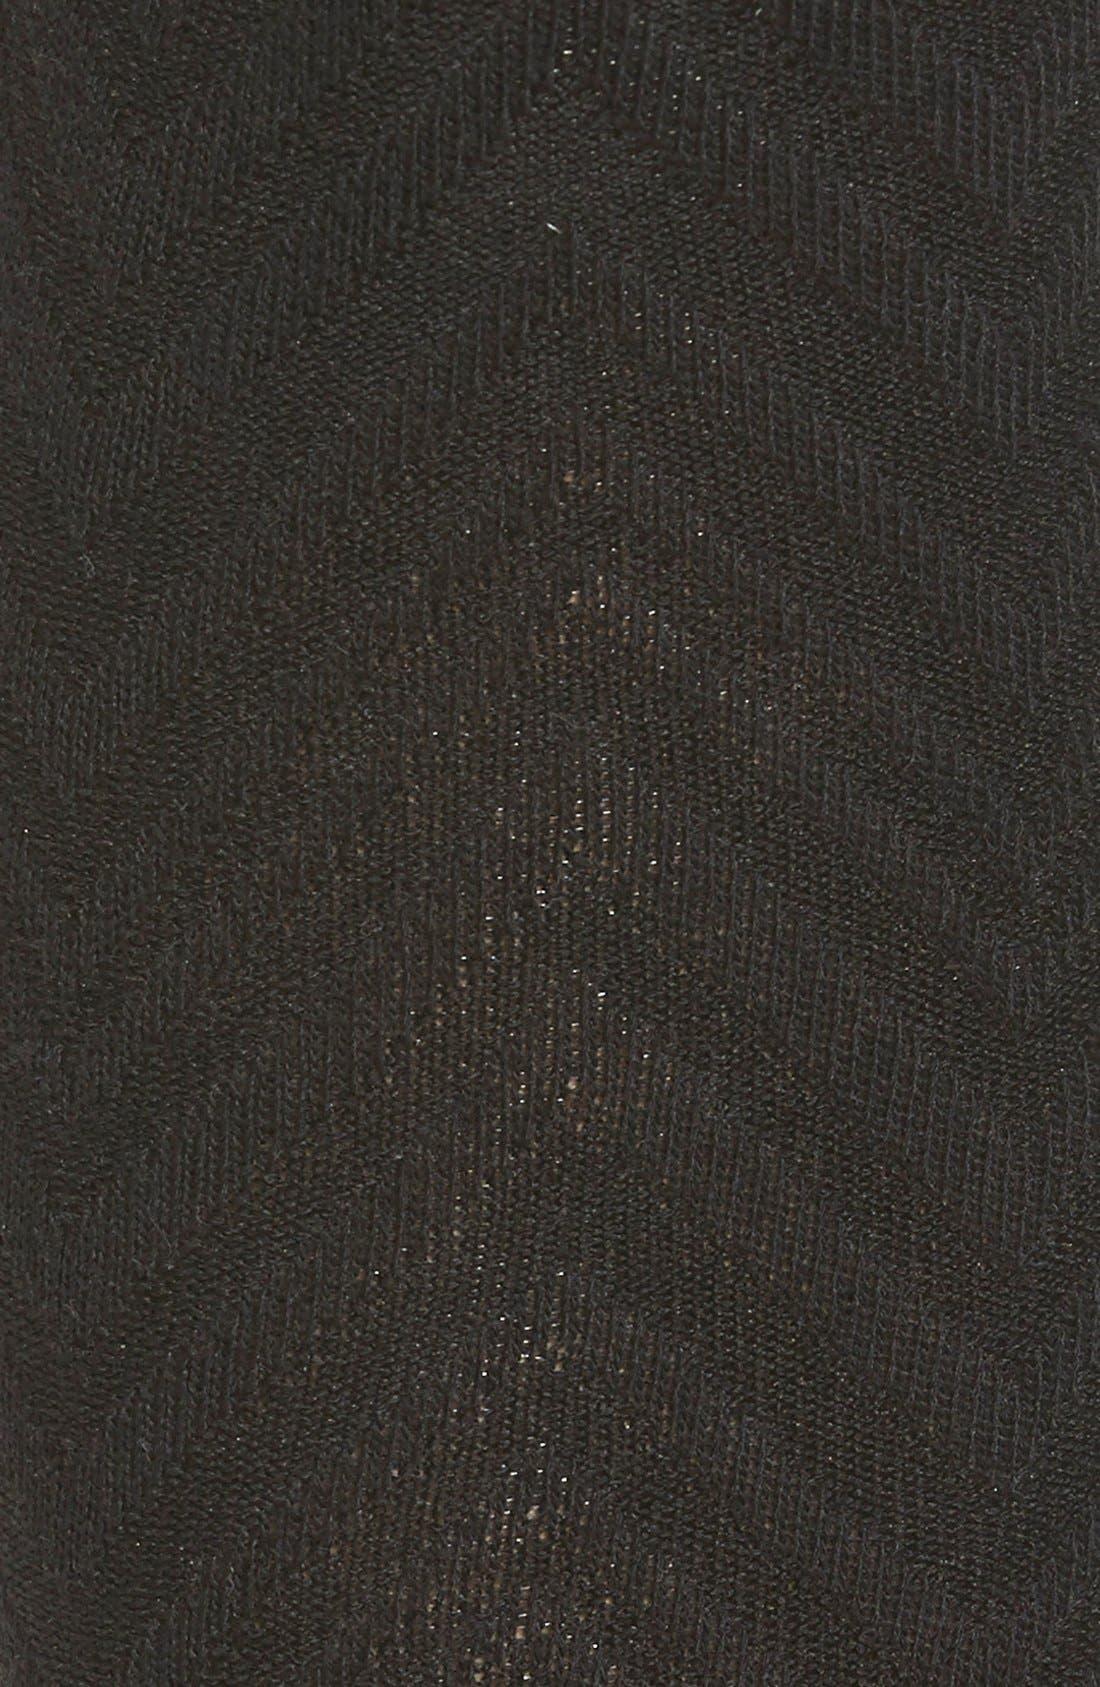 Chevron Stripe Tights with Stirrup Straps,                             Alternate thumbnail 2, color,                             001